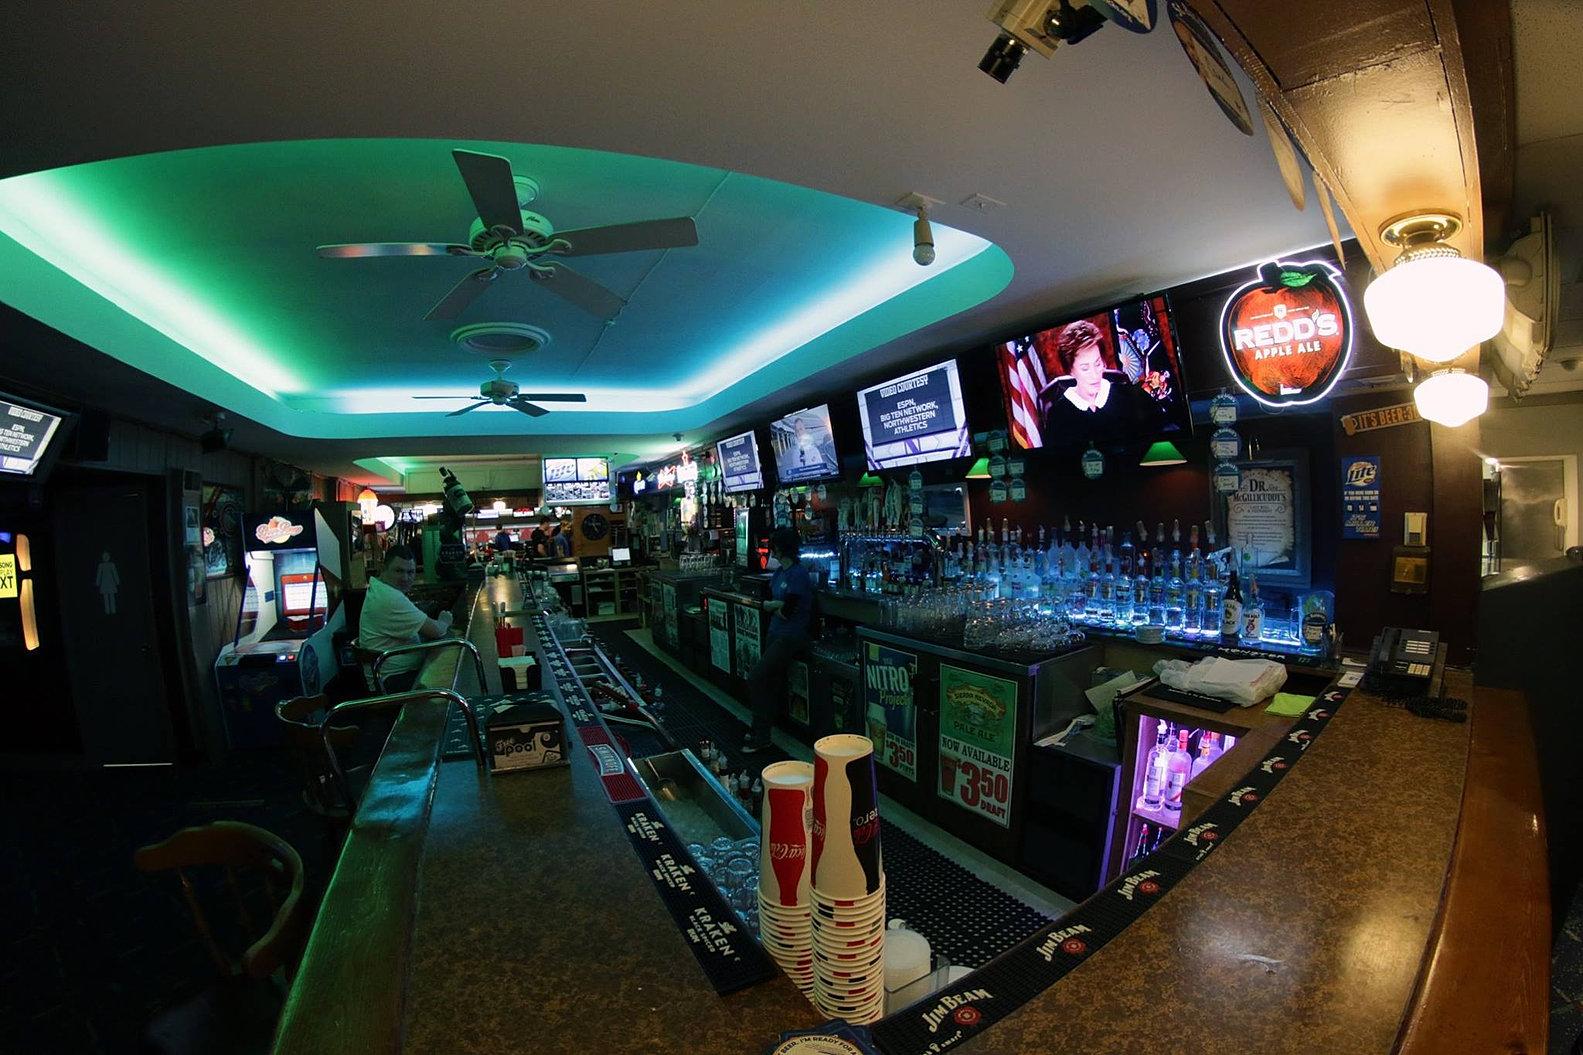 kristof u0026 39 s entertainment center in round lake beach  il